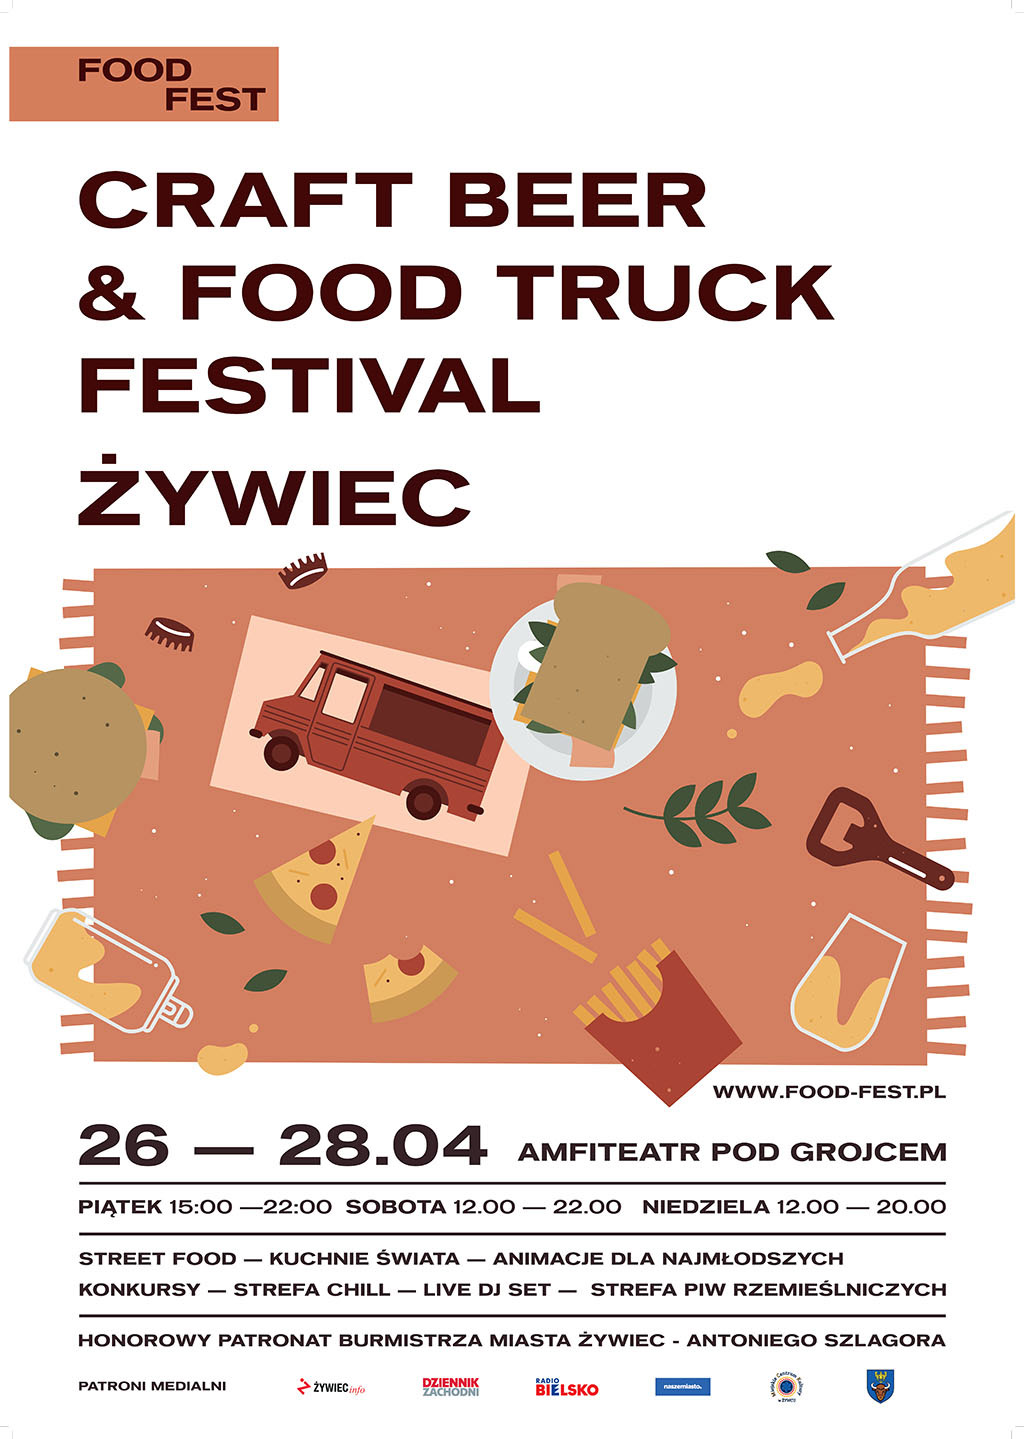 Craft Beer & Food Truck Festival Żywiec